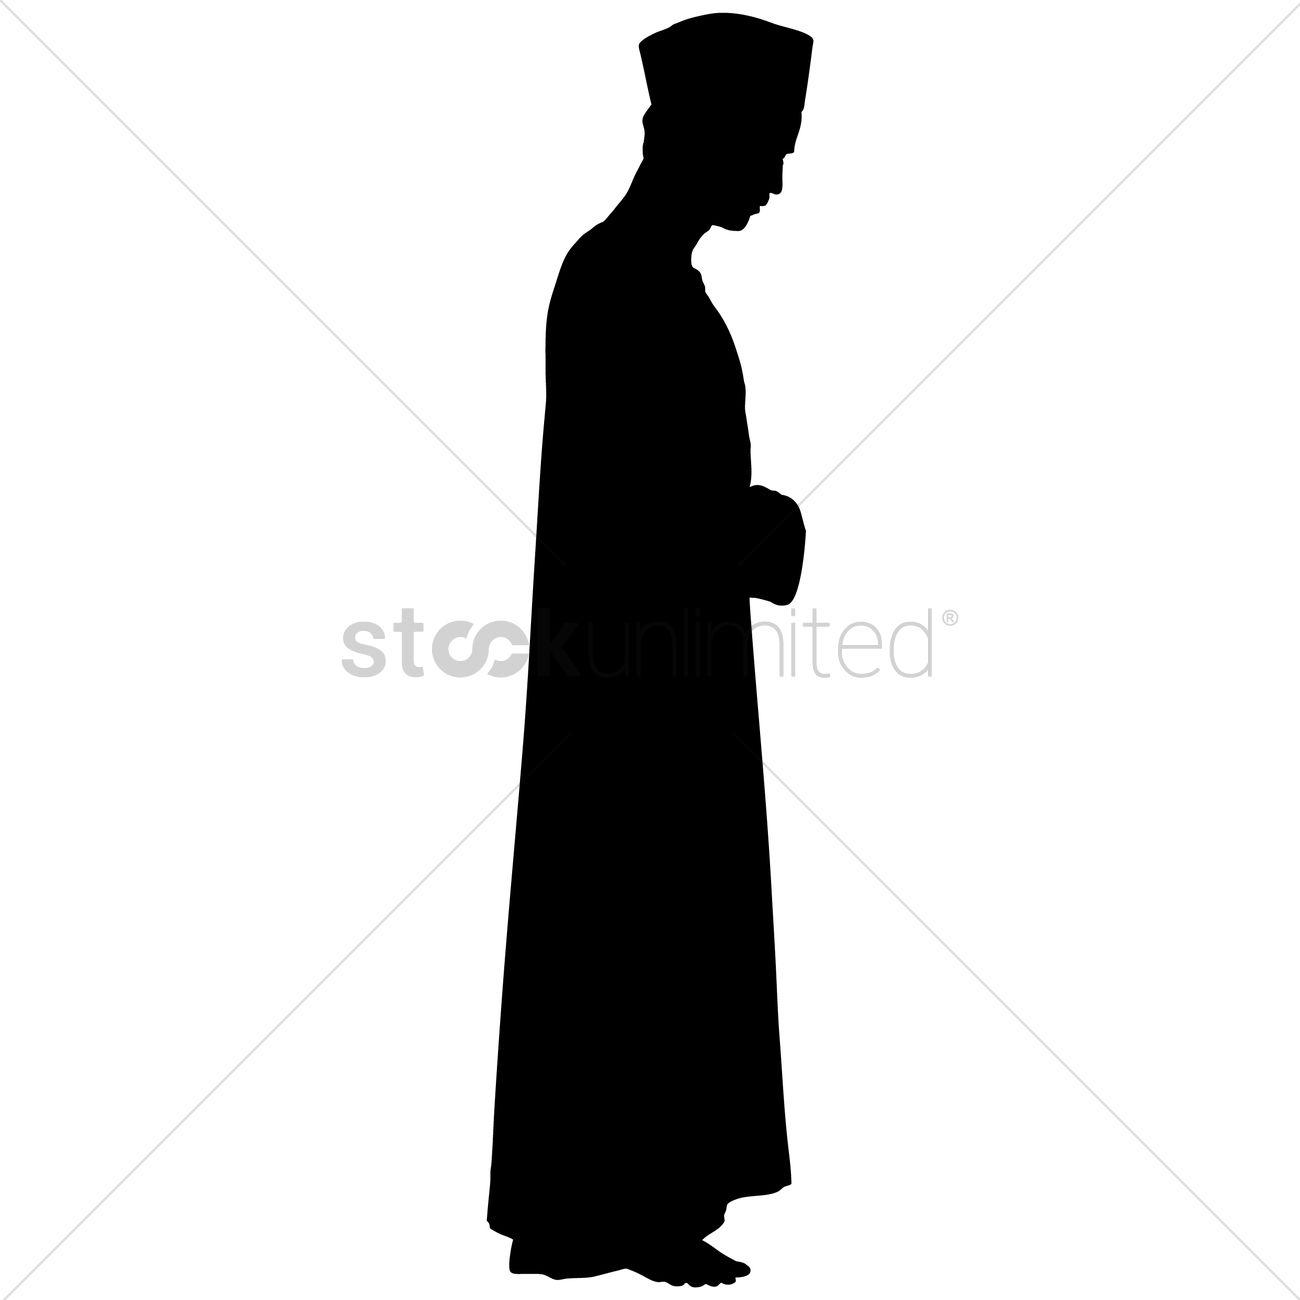 1300x1300 Praying Men Silhouette Clipart